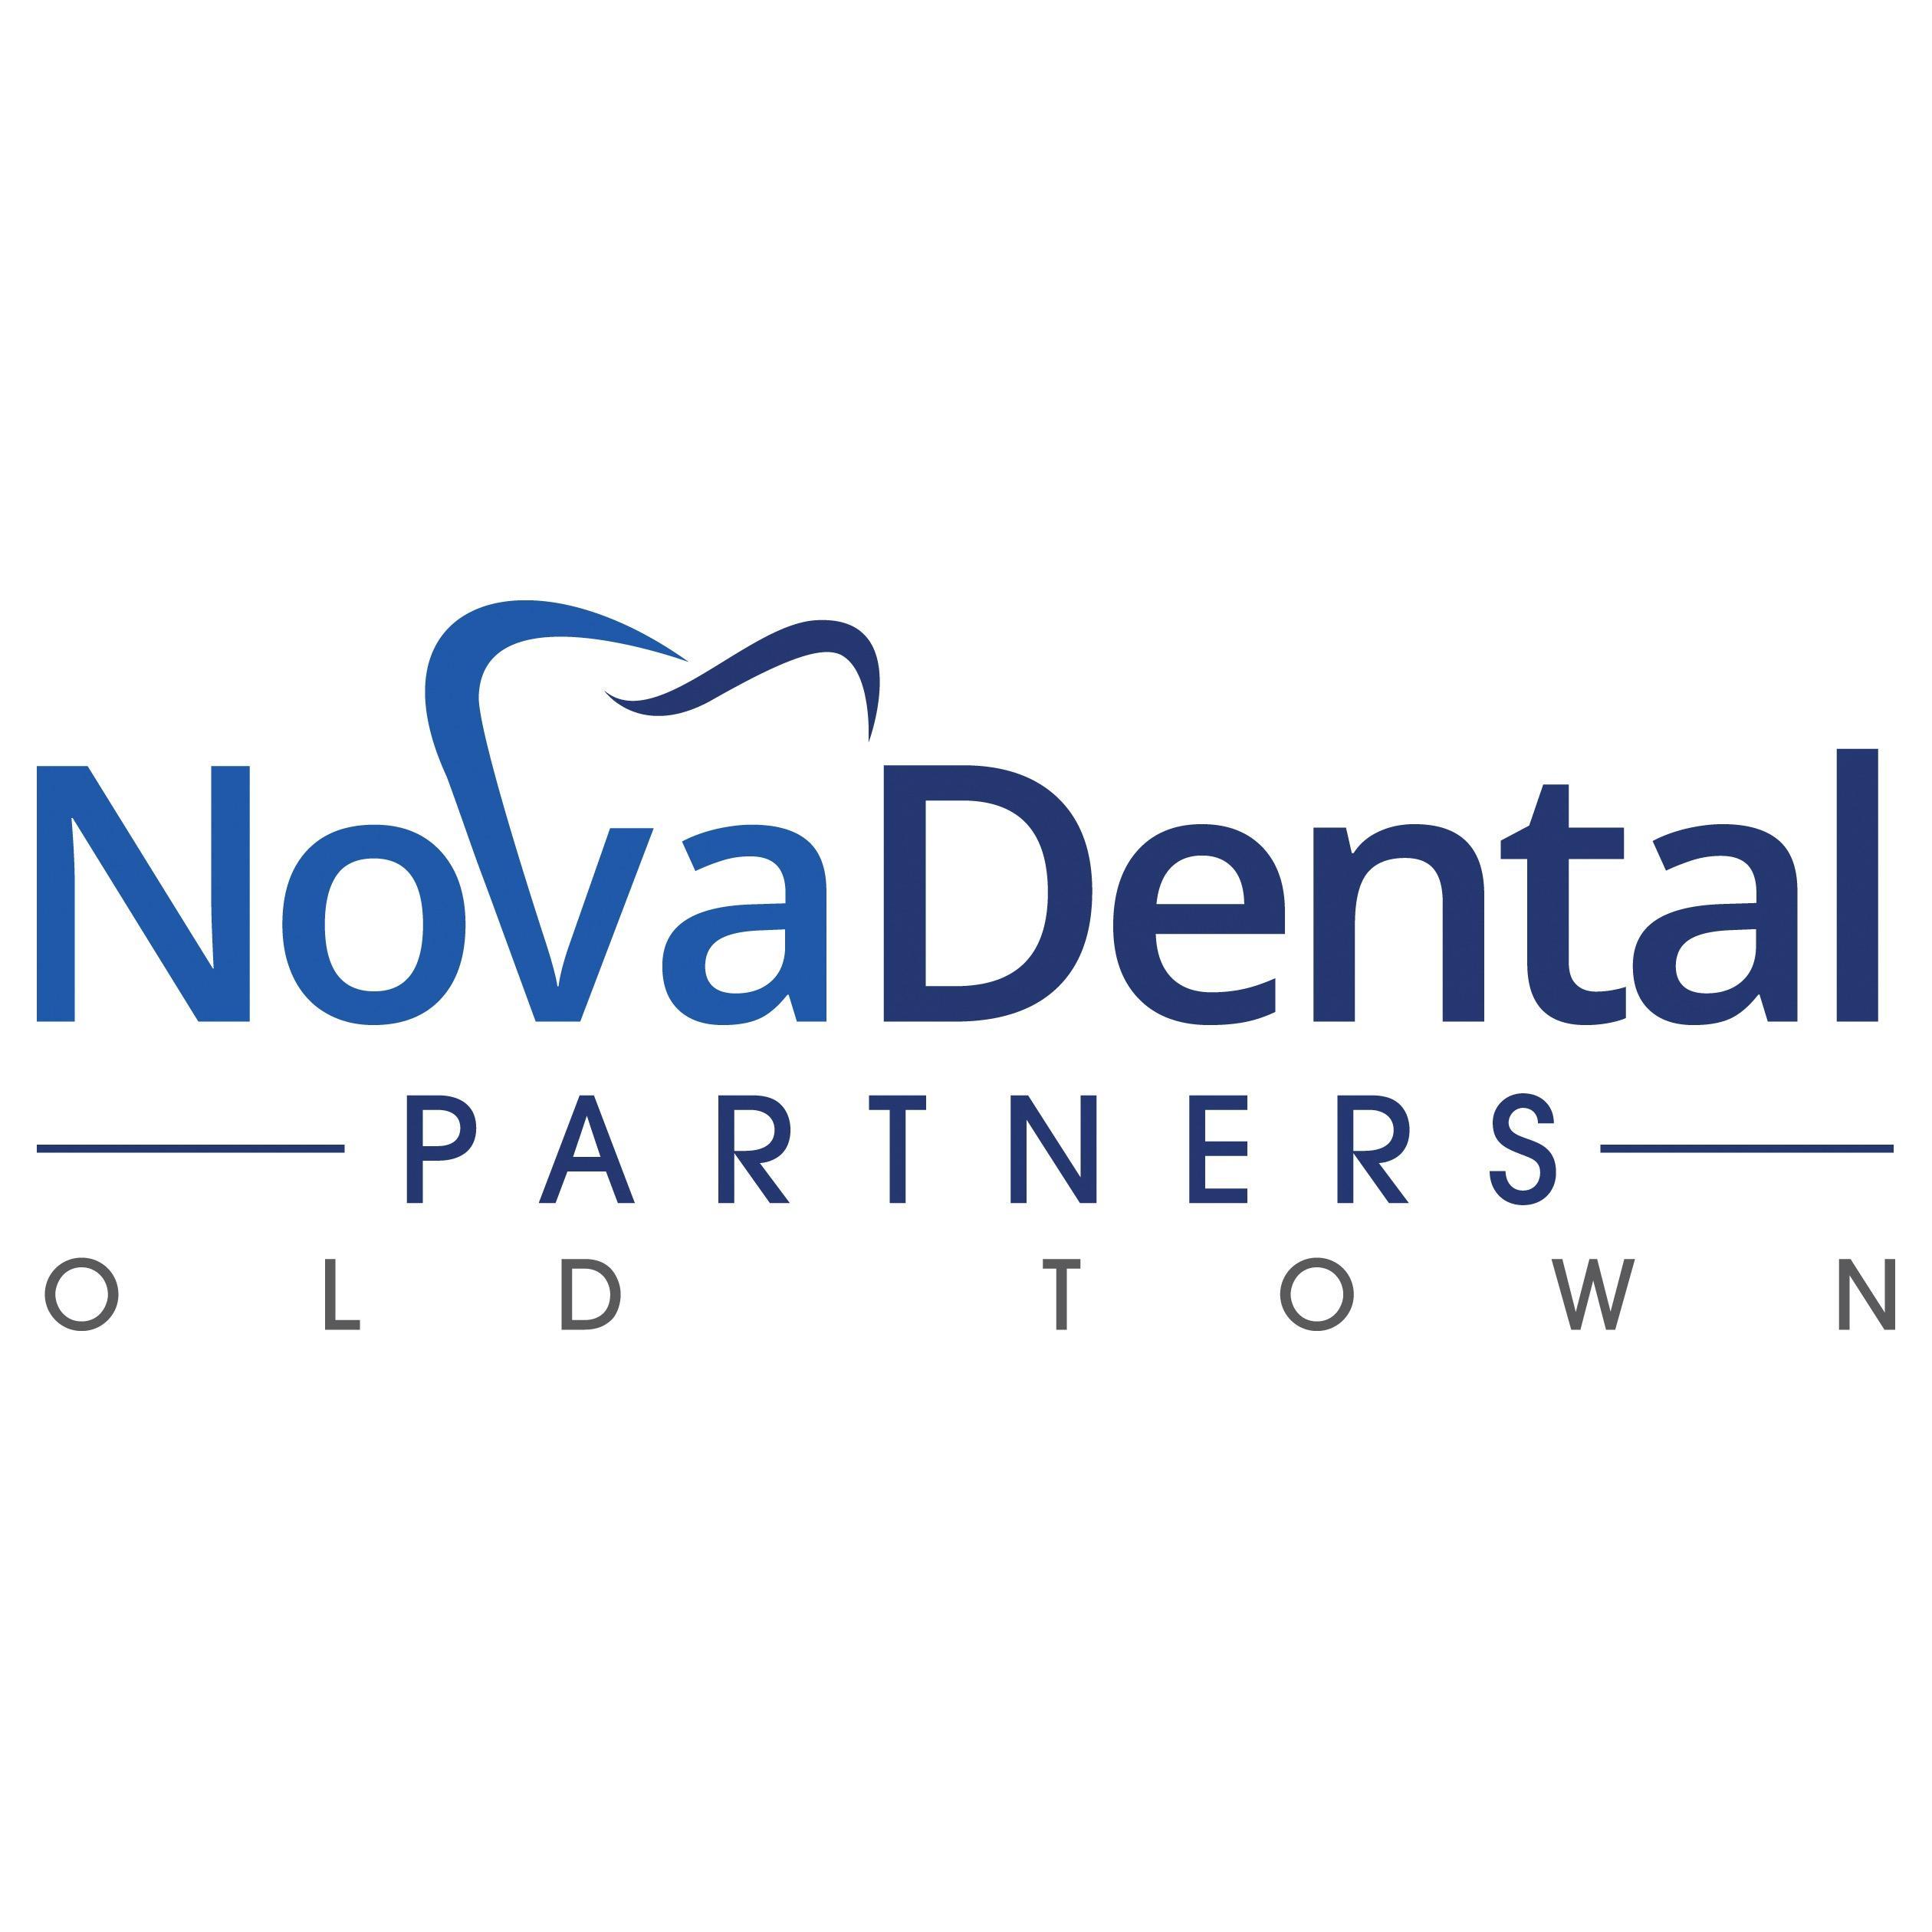 Nova Dental Partners - Old Town